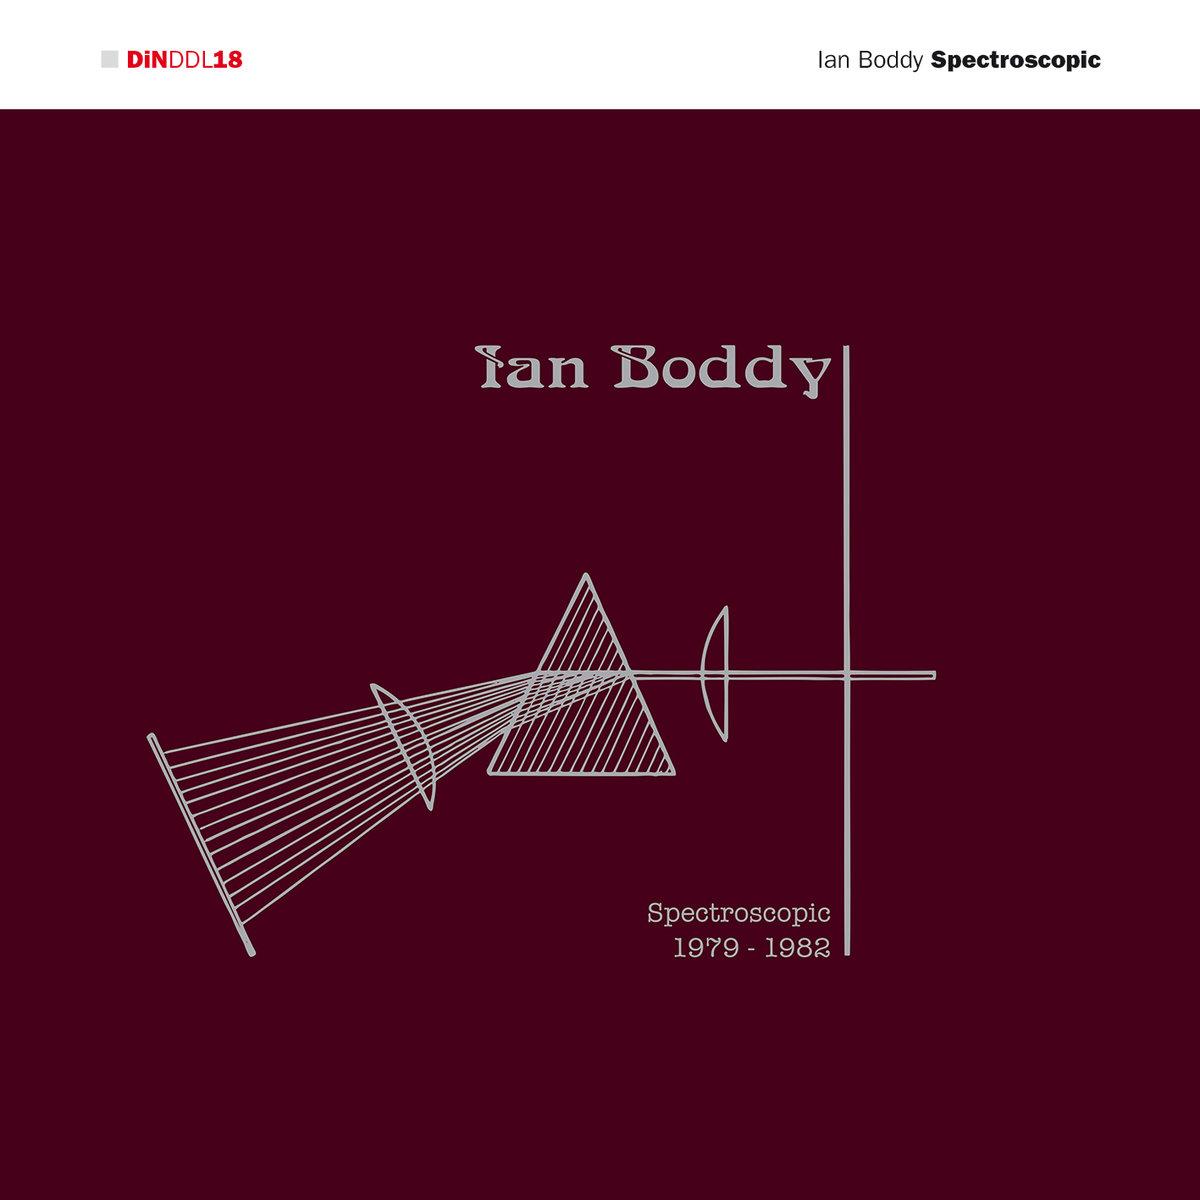 64. Ian Boddy - Spectroscopic DiNDDL18